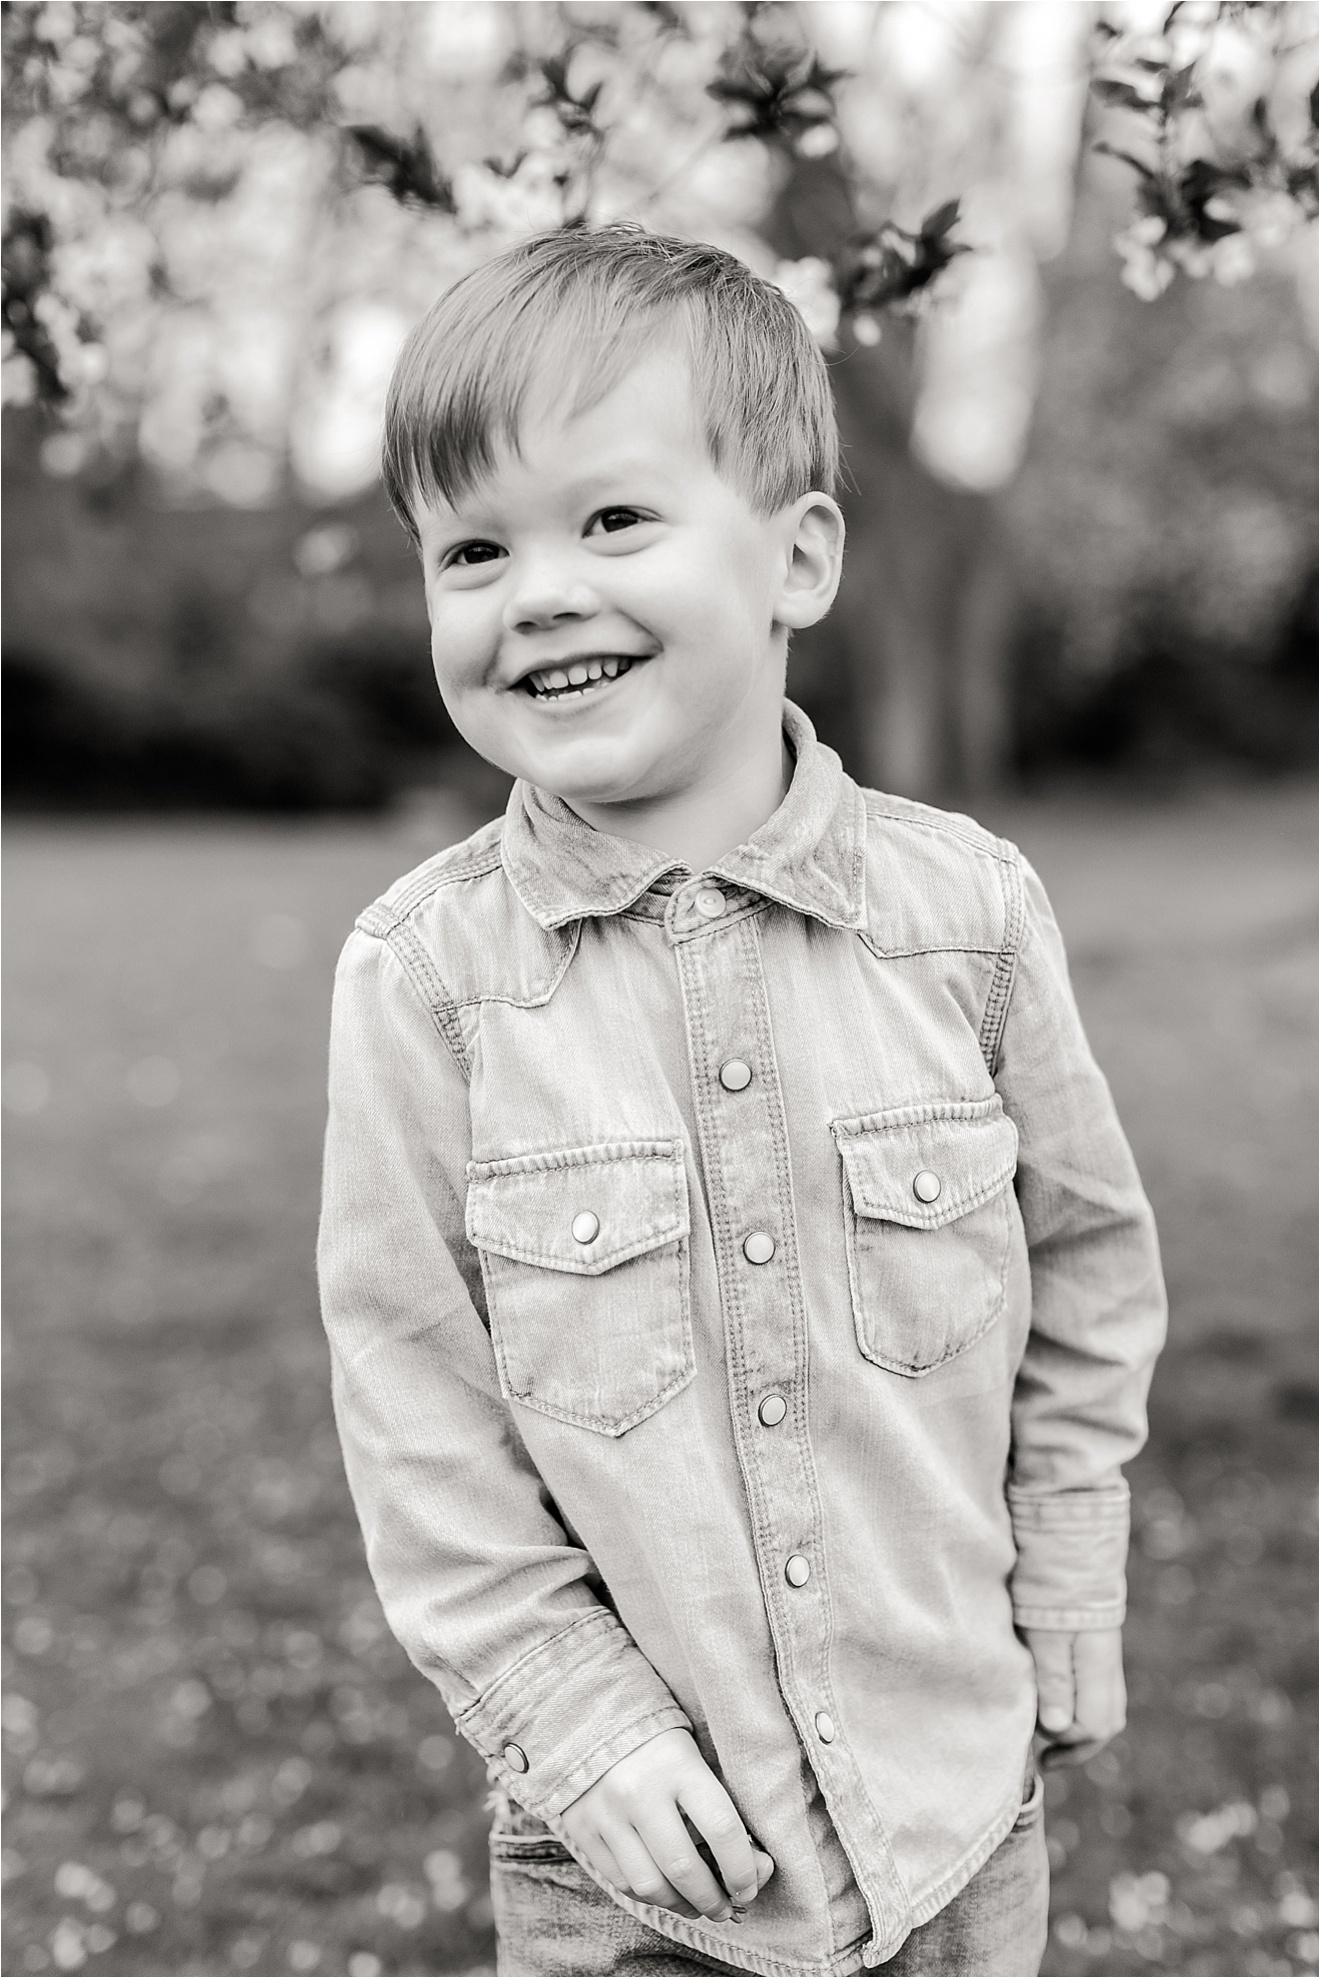 family-photography-spring-weybridge-eddie-judd-photography_0018